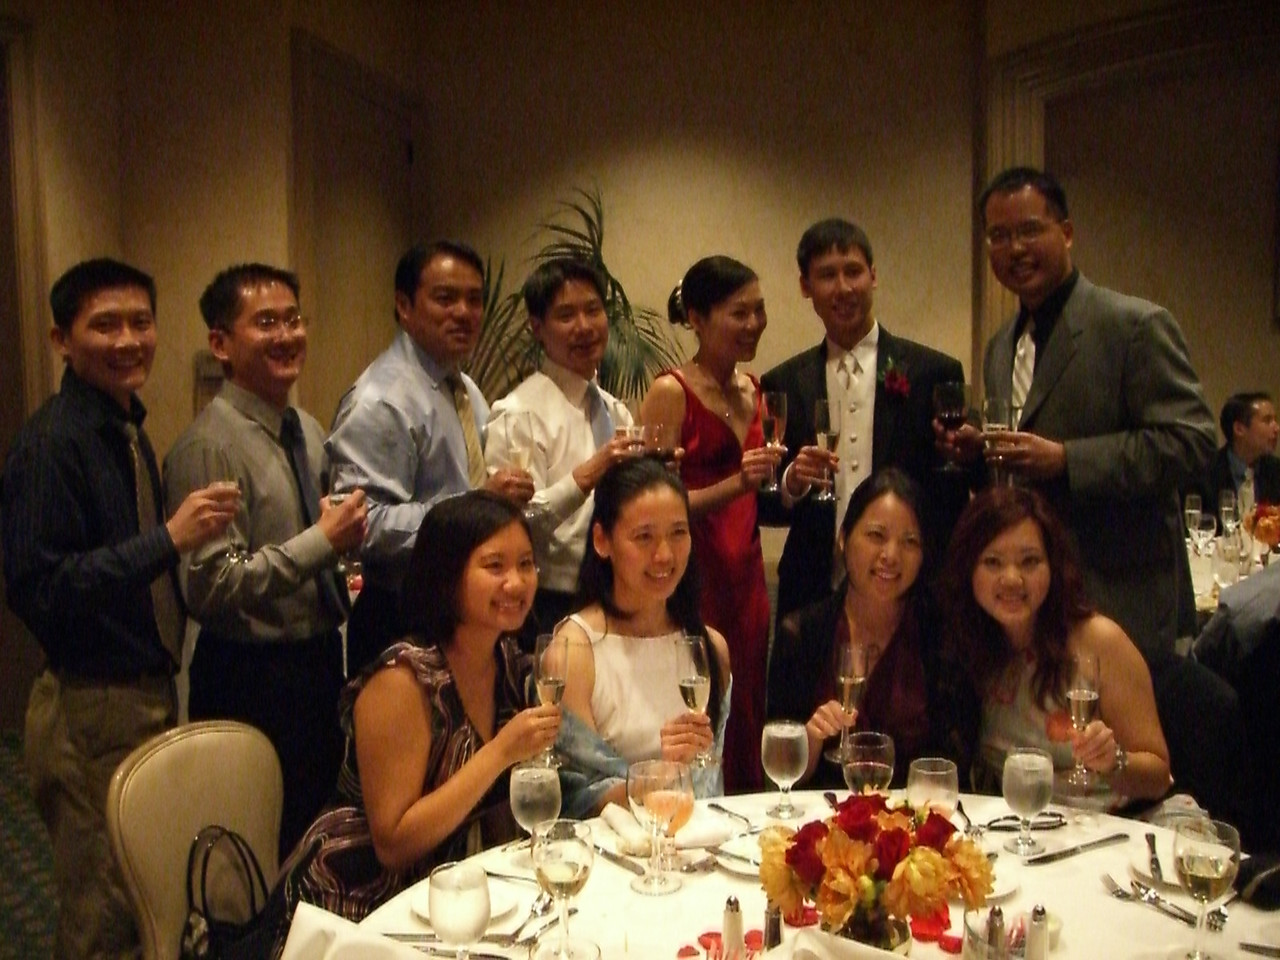 Table pic with bride & groom - EFC-Harvest Berkeley older classes 2